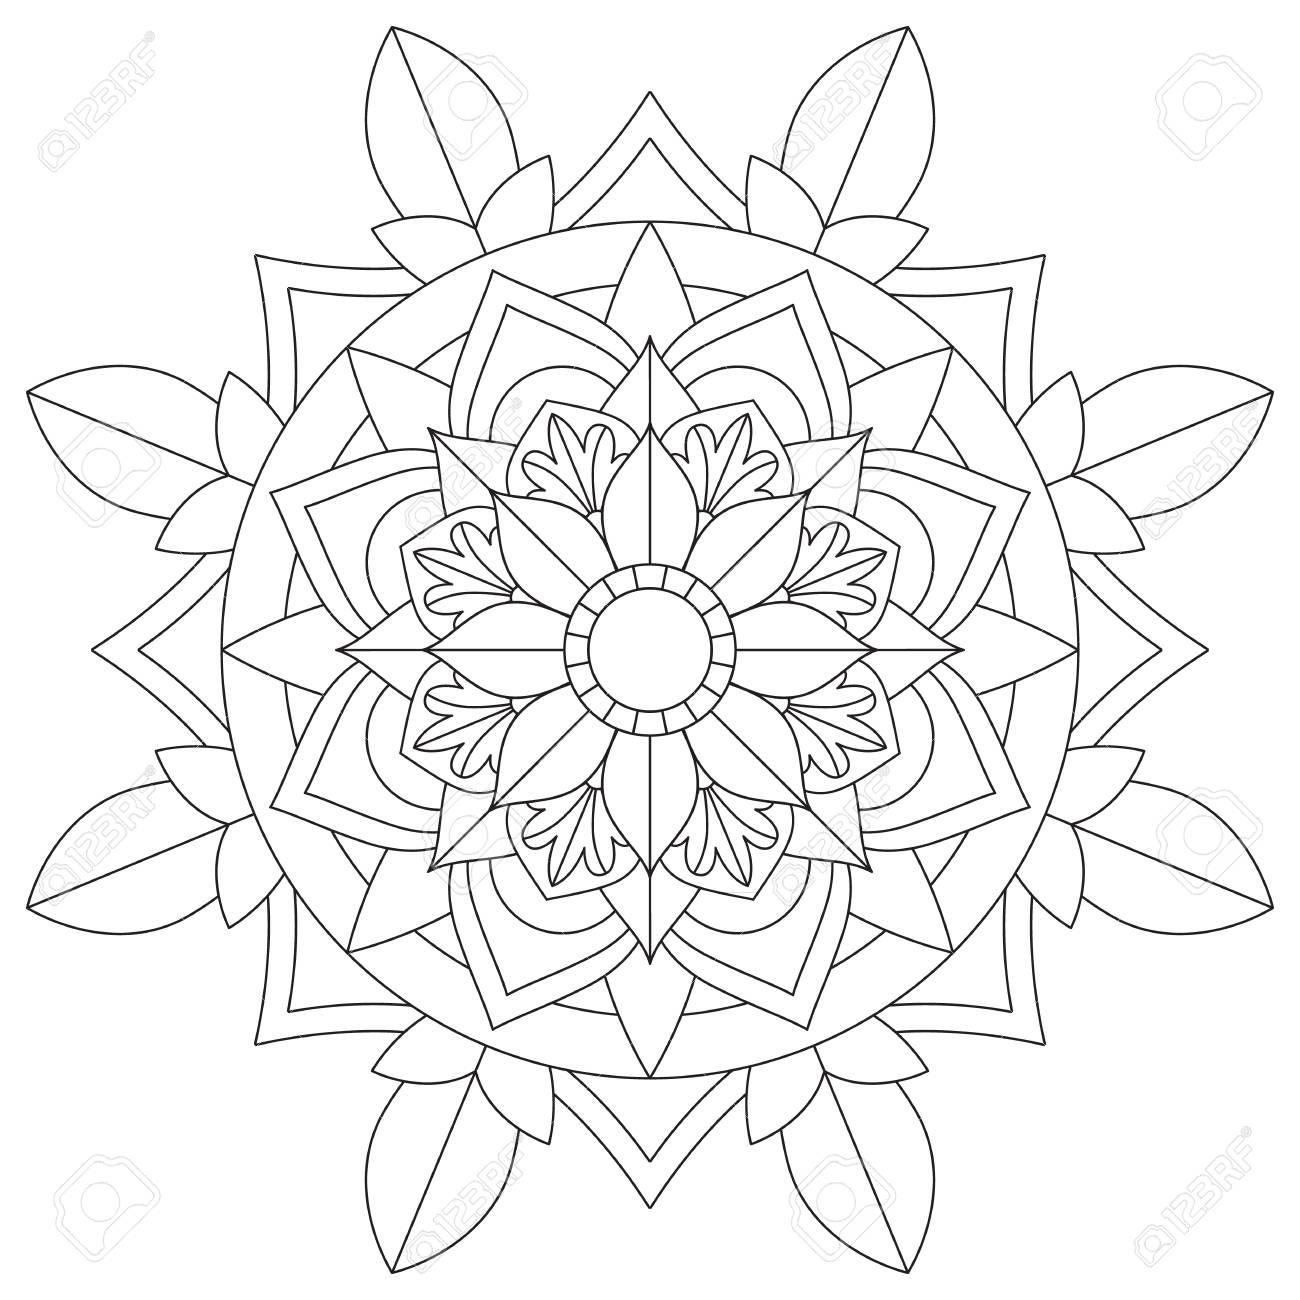 Flower Mandala For Coloring Pages Lizenzfrei Nutzbare Vektorgrafiken